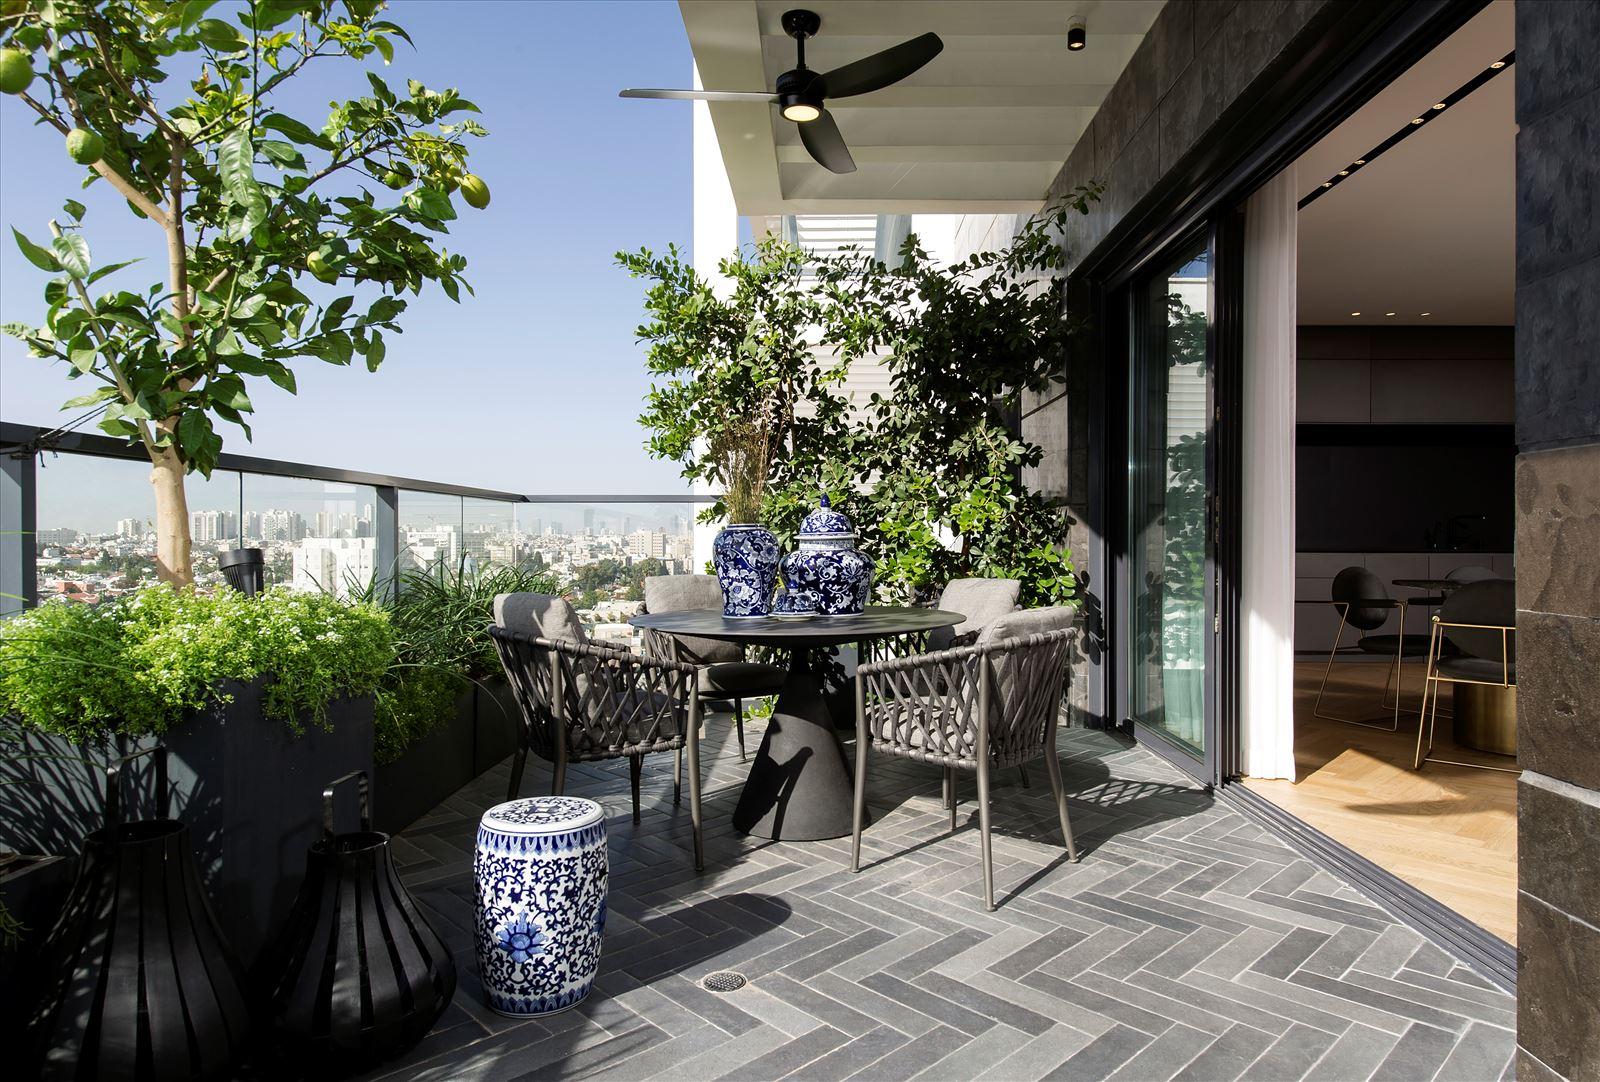 Penthouse - Petah Tikva עיצוב מרפסת הדירה בגופי תאורה מיוחדים בתכנון דורי קמחי